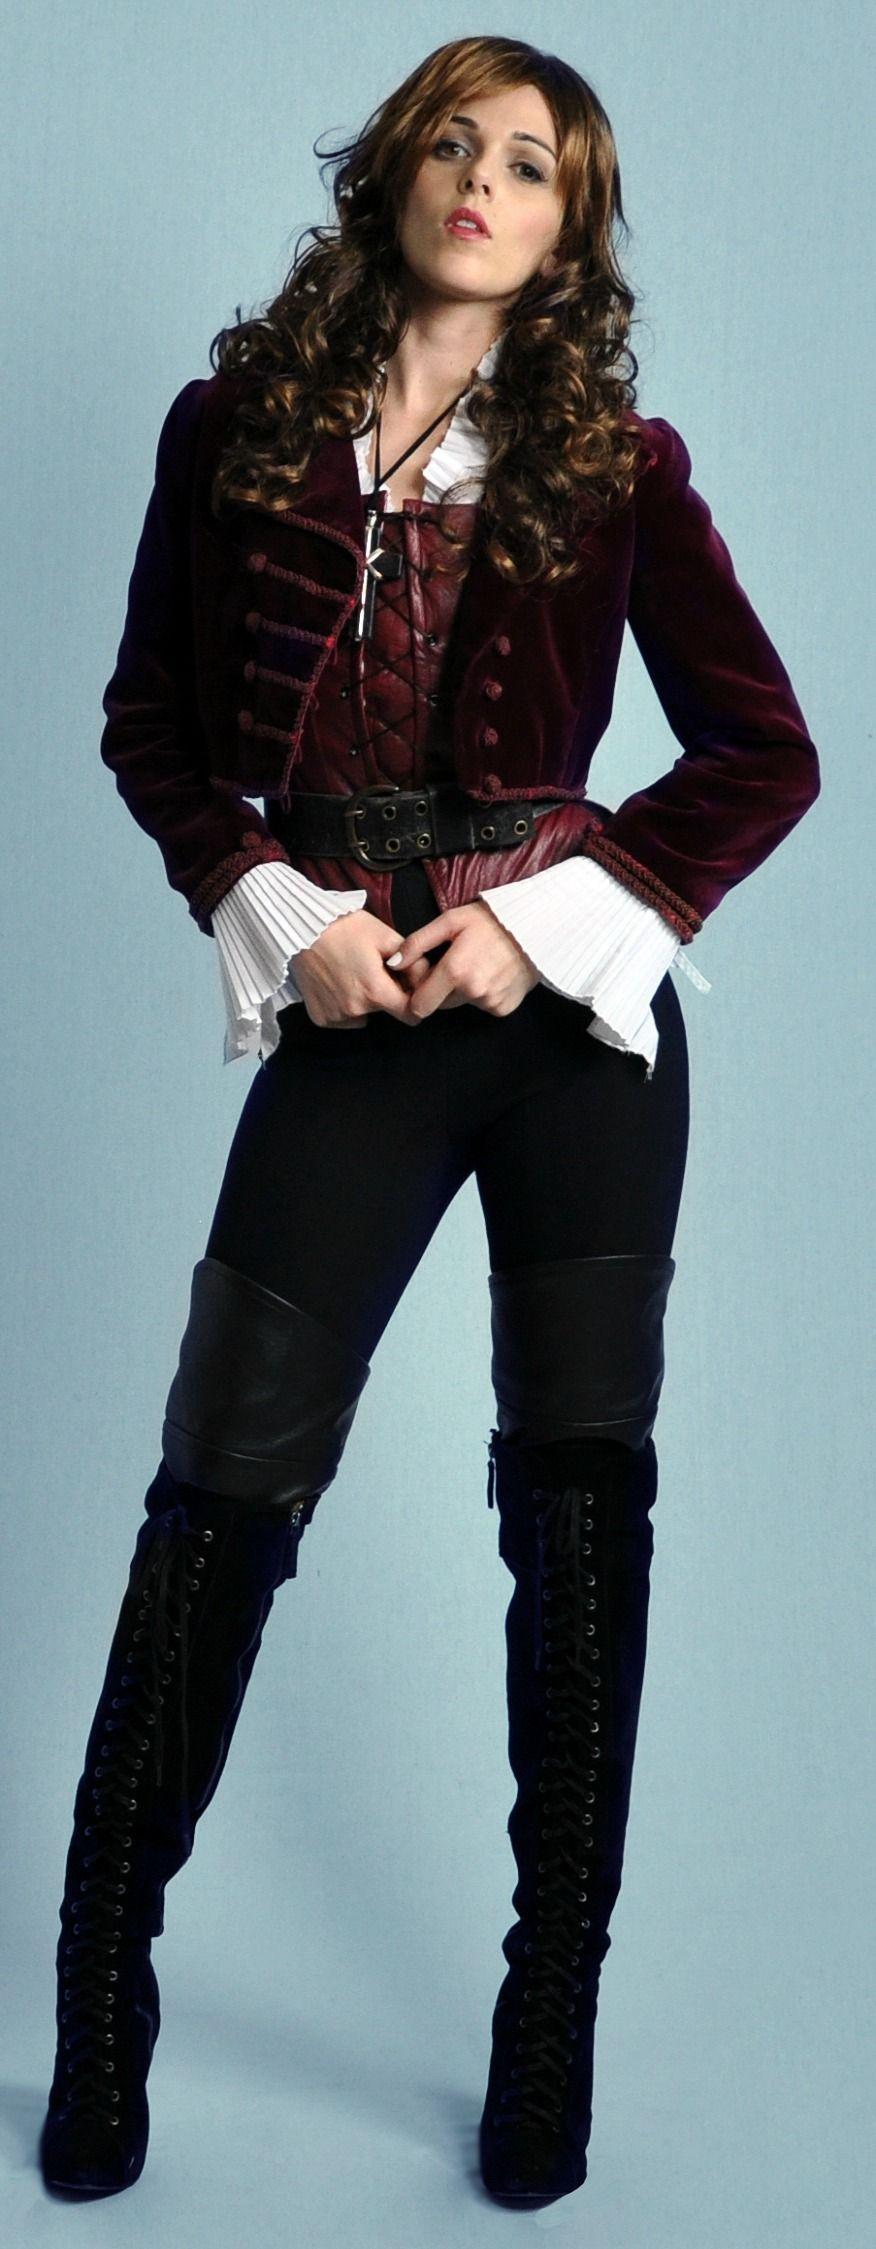 Vampire Hunter, Halloween costume to hire from Tne Costume Shop ...